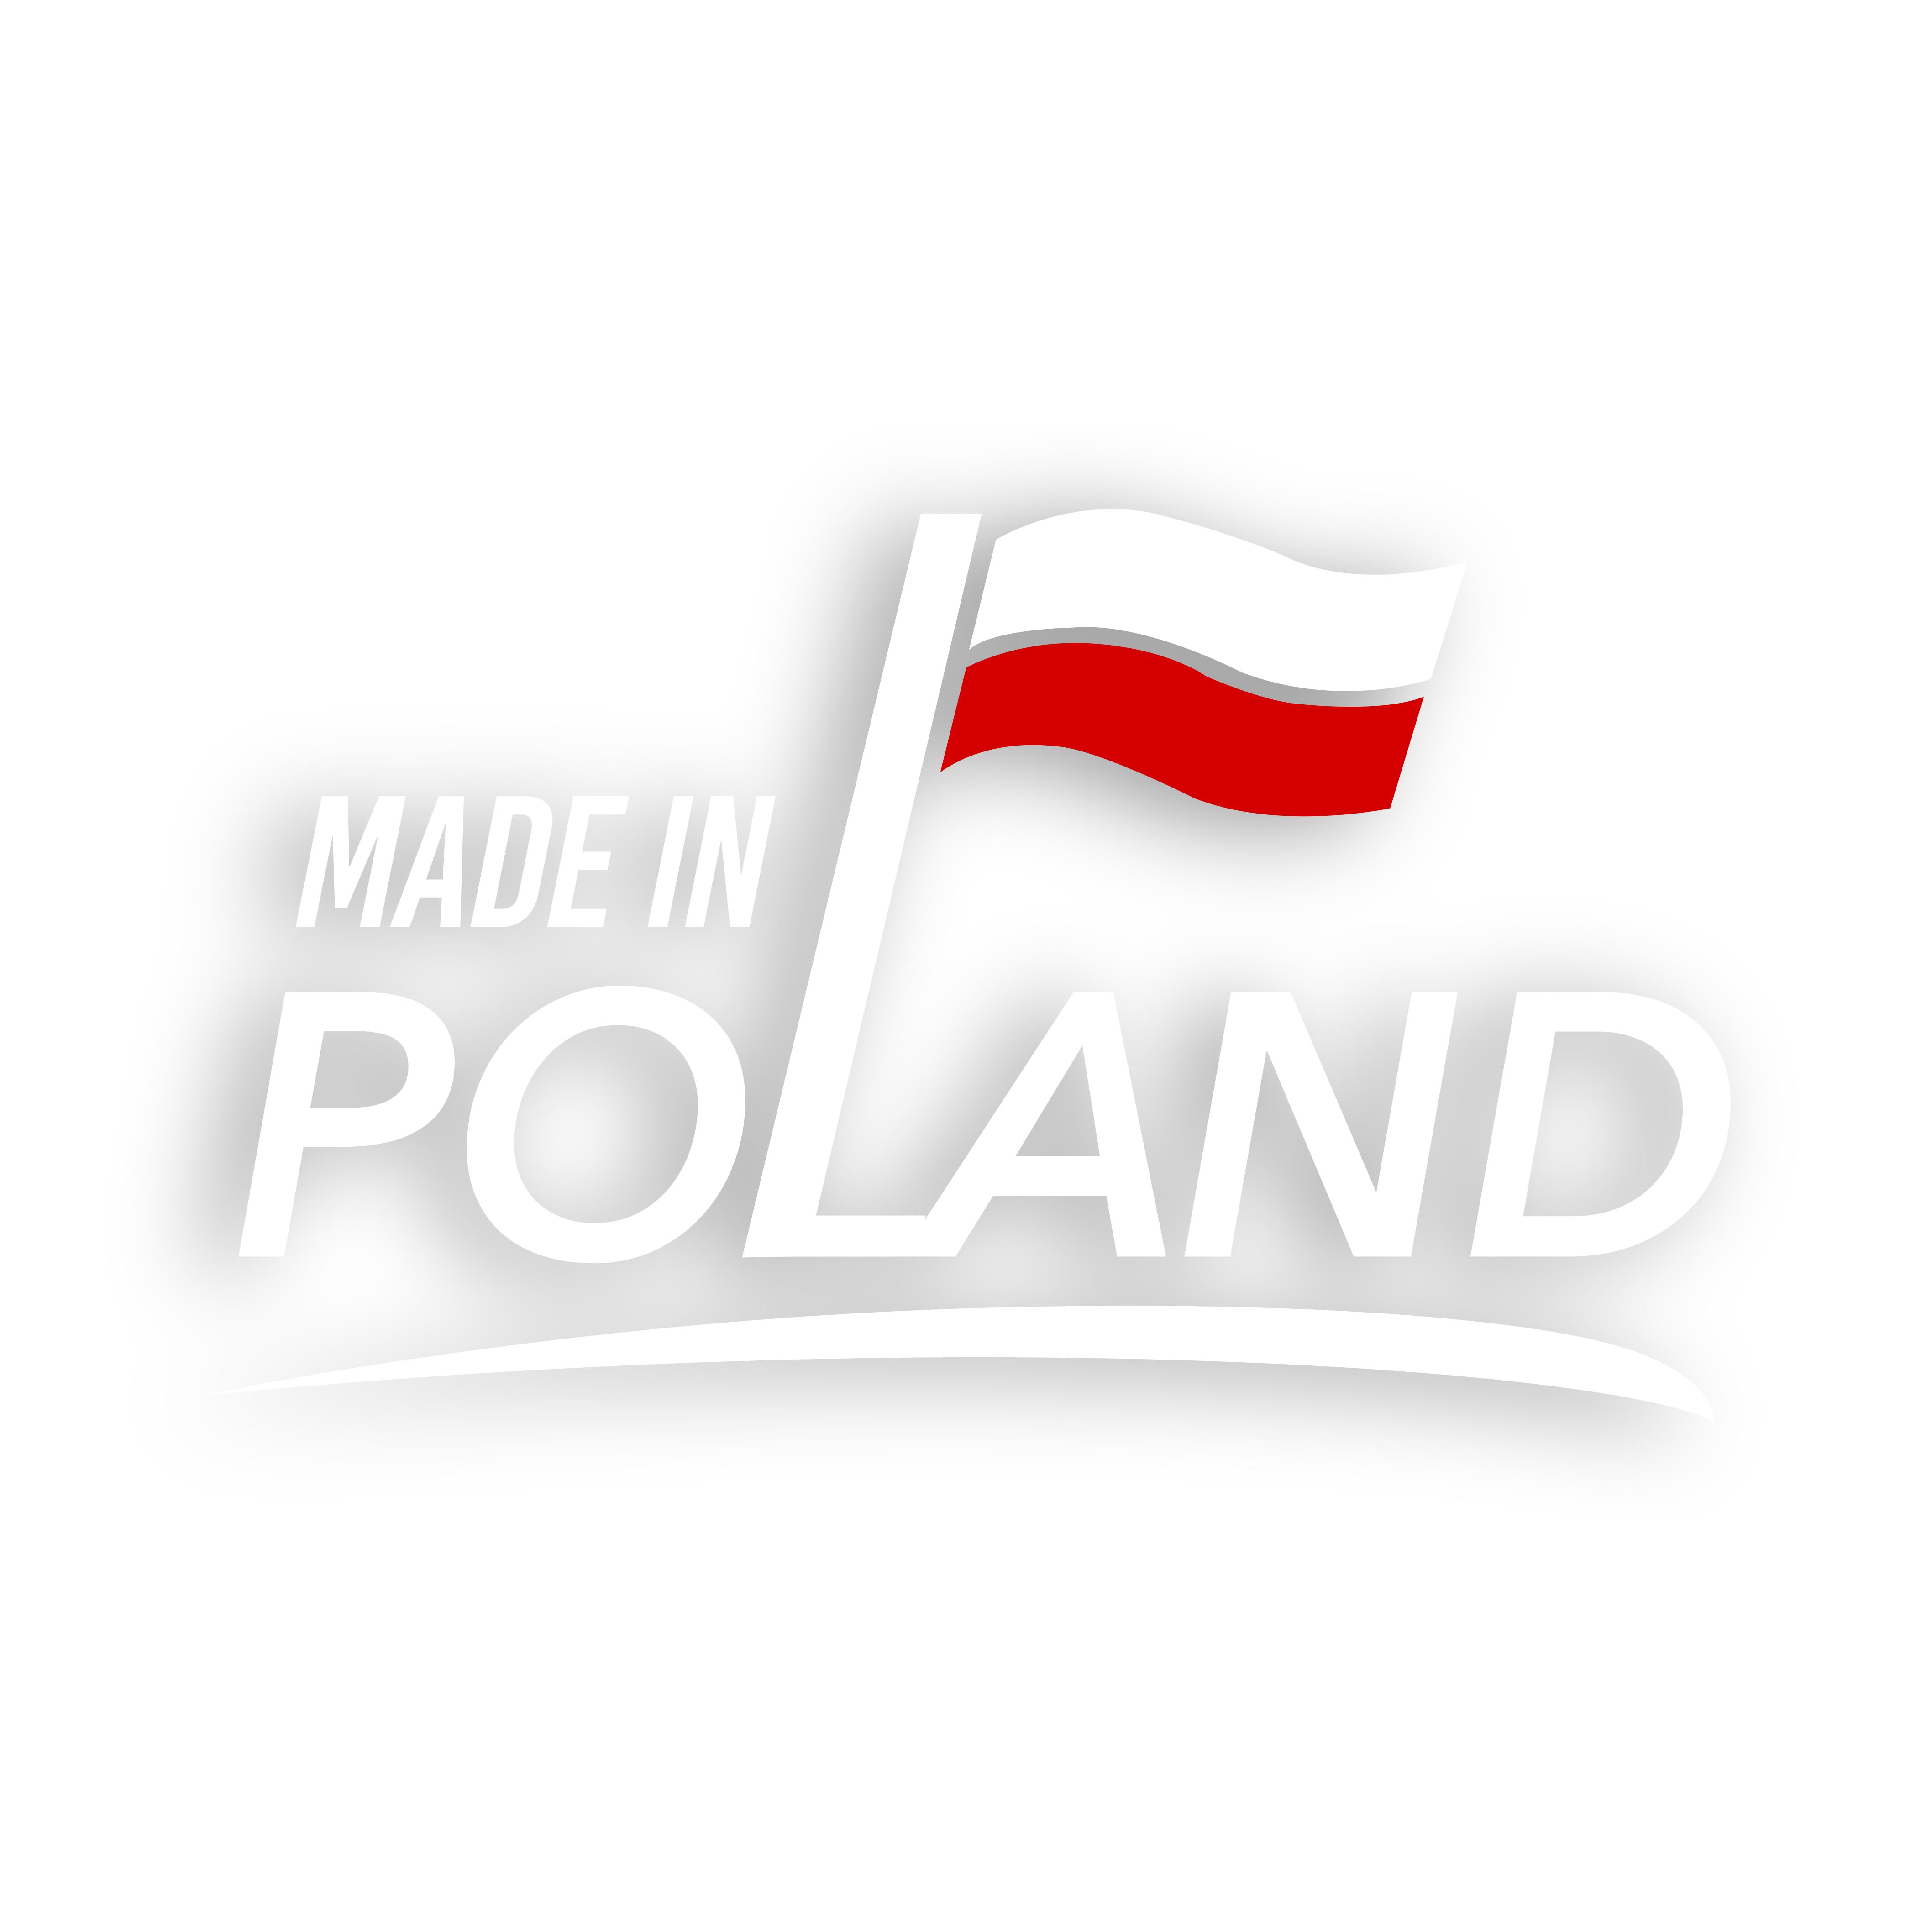 MadeInPoland Portal